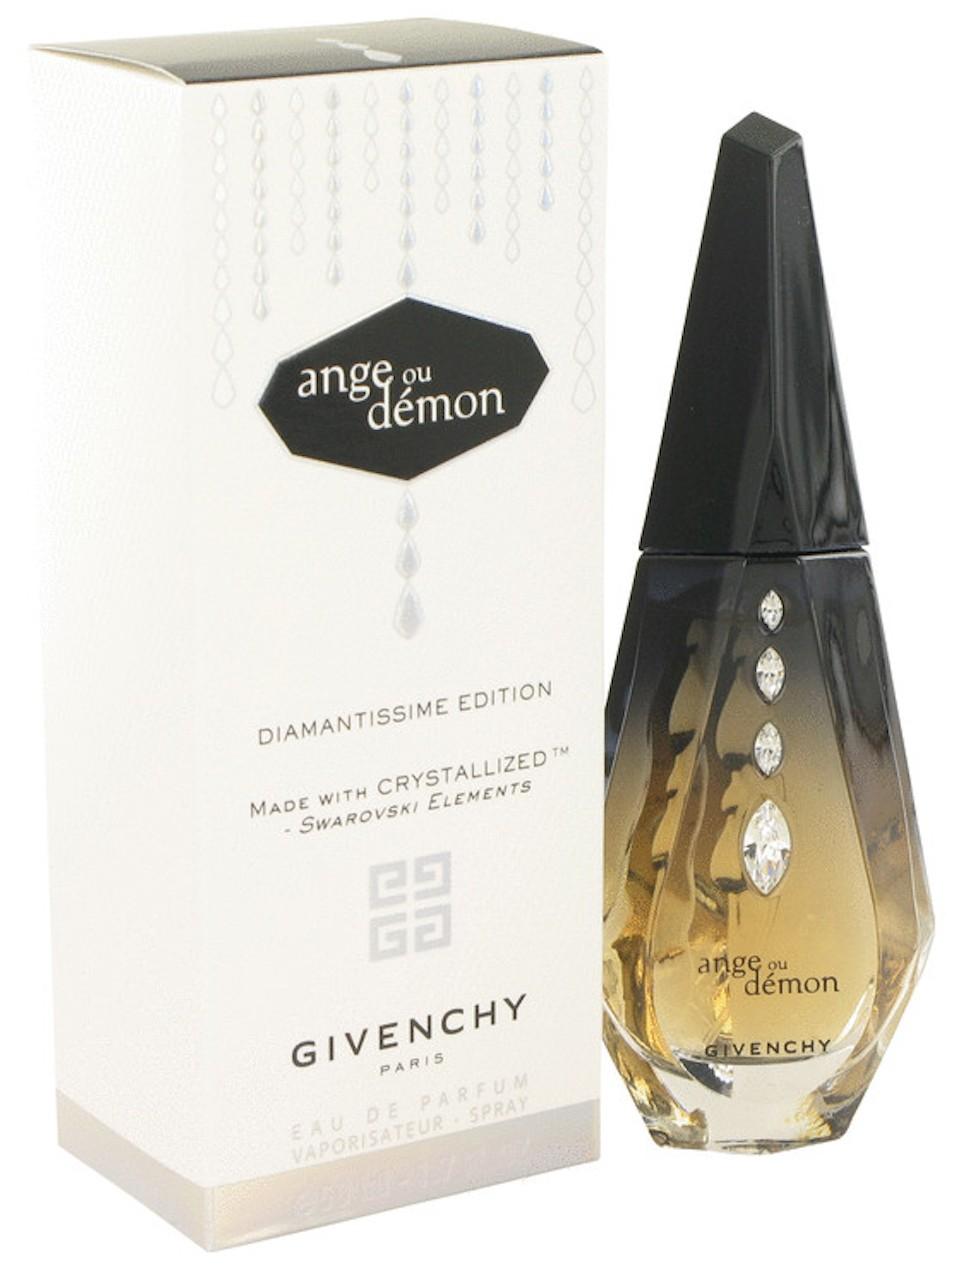 givenchy ange ou demon diamantissime edition